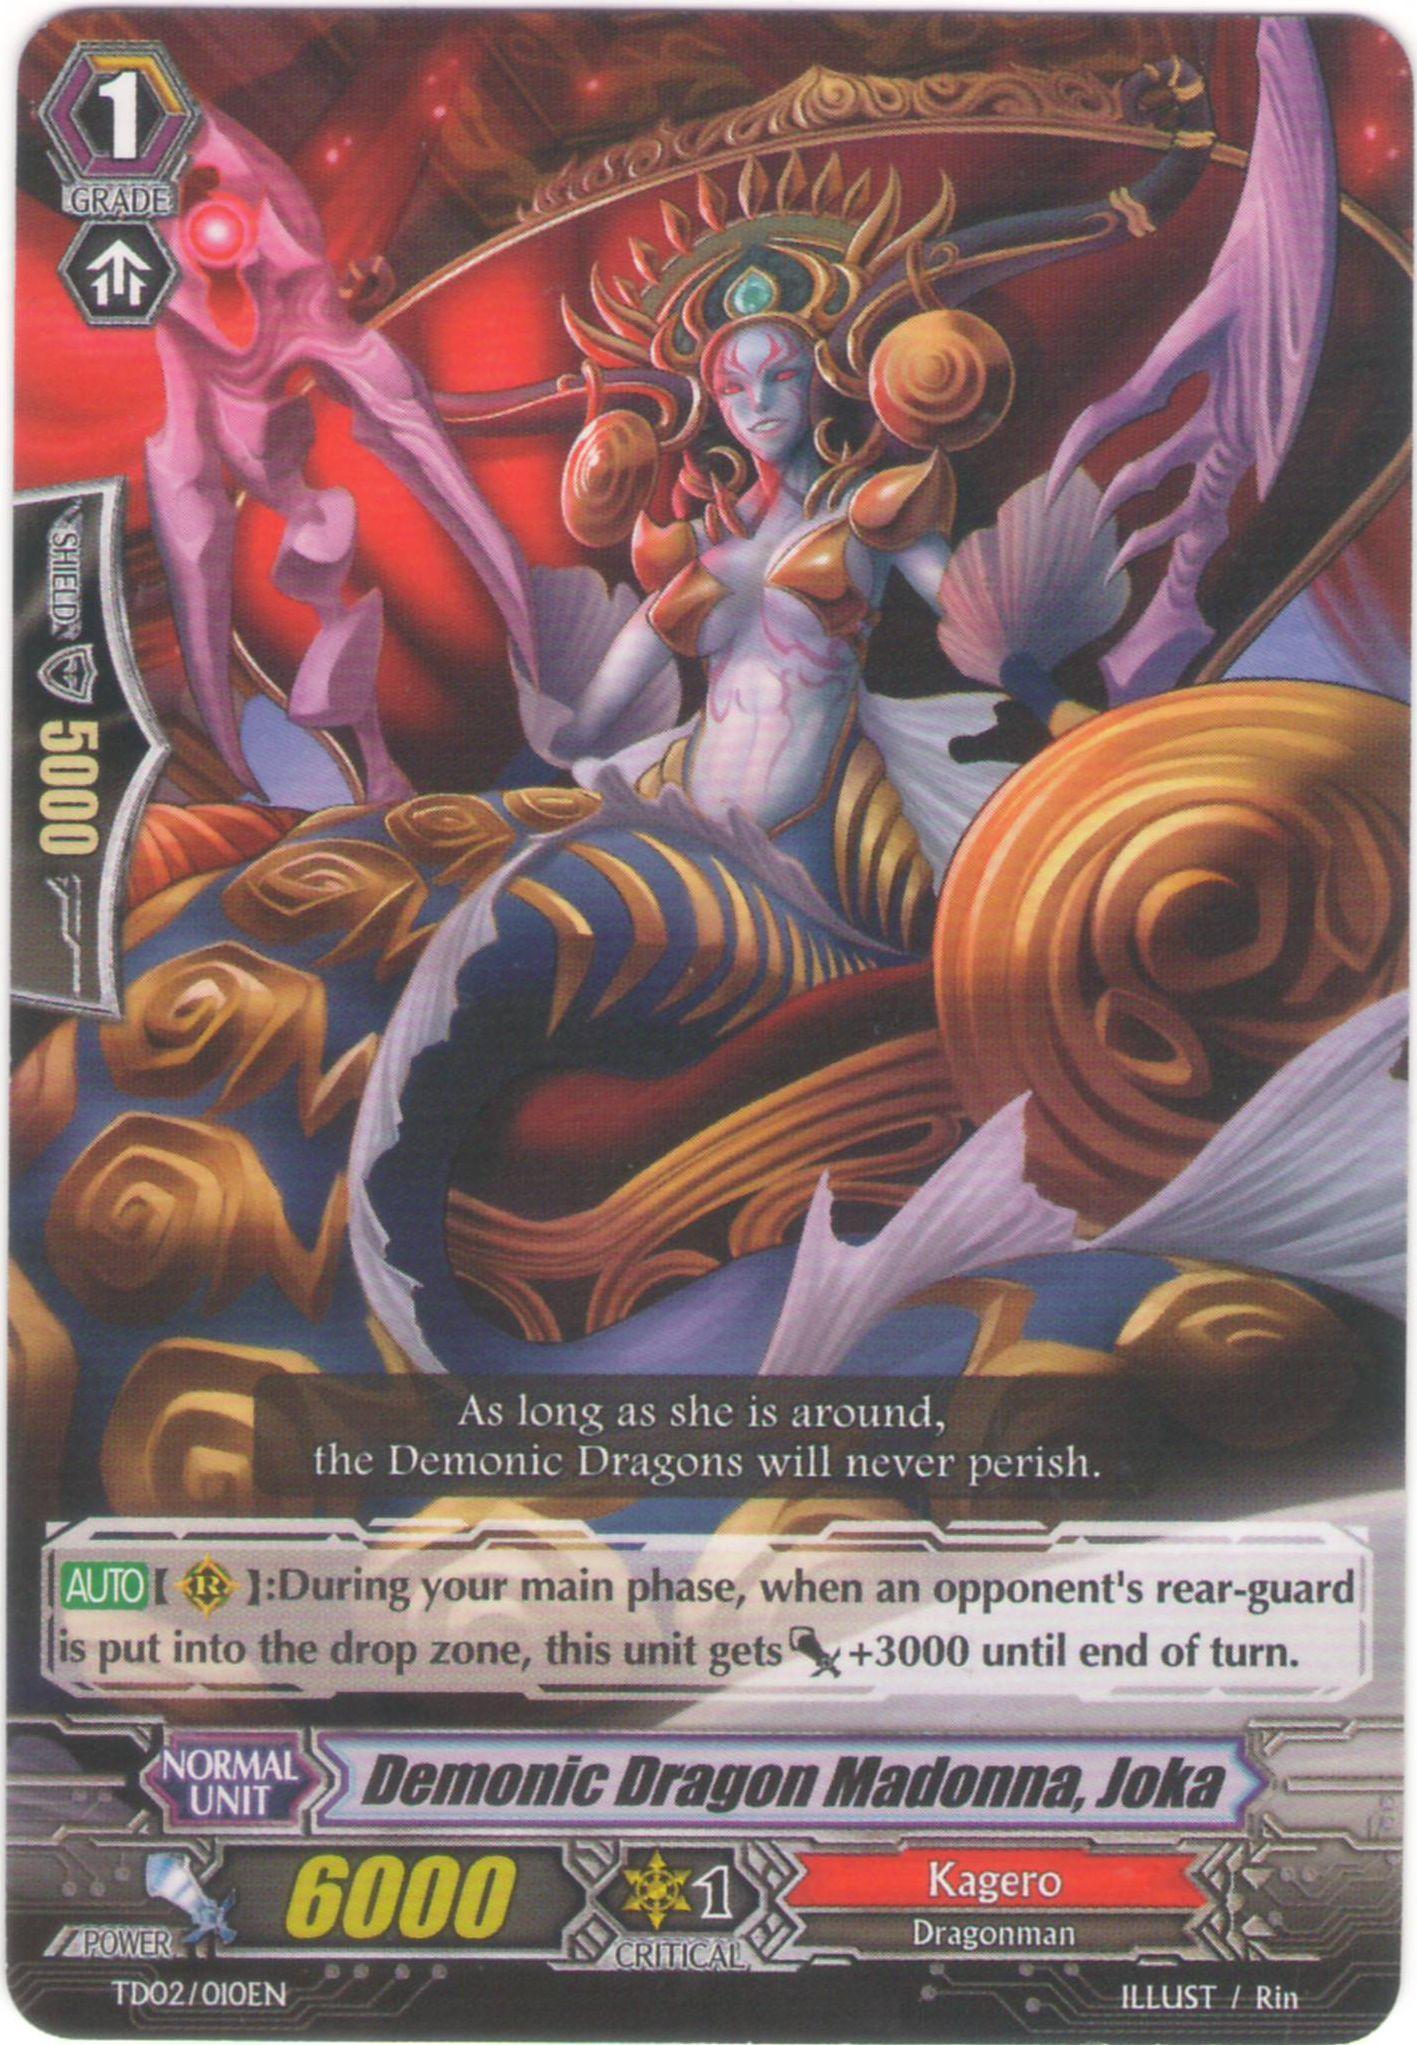 Demonic Dragon Madonna, Joka - EB09/026EN - C